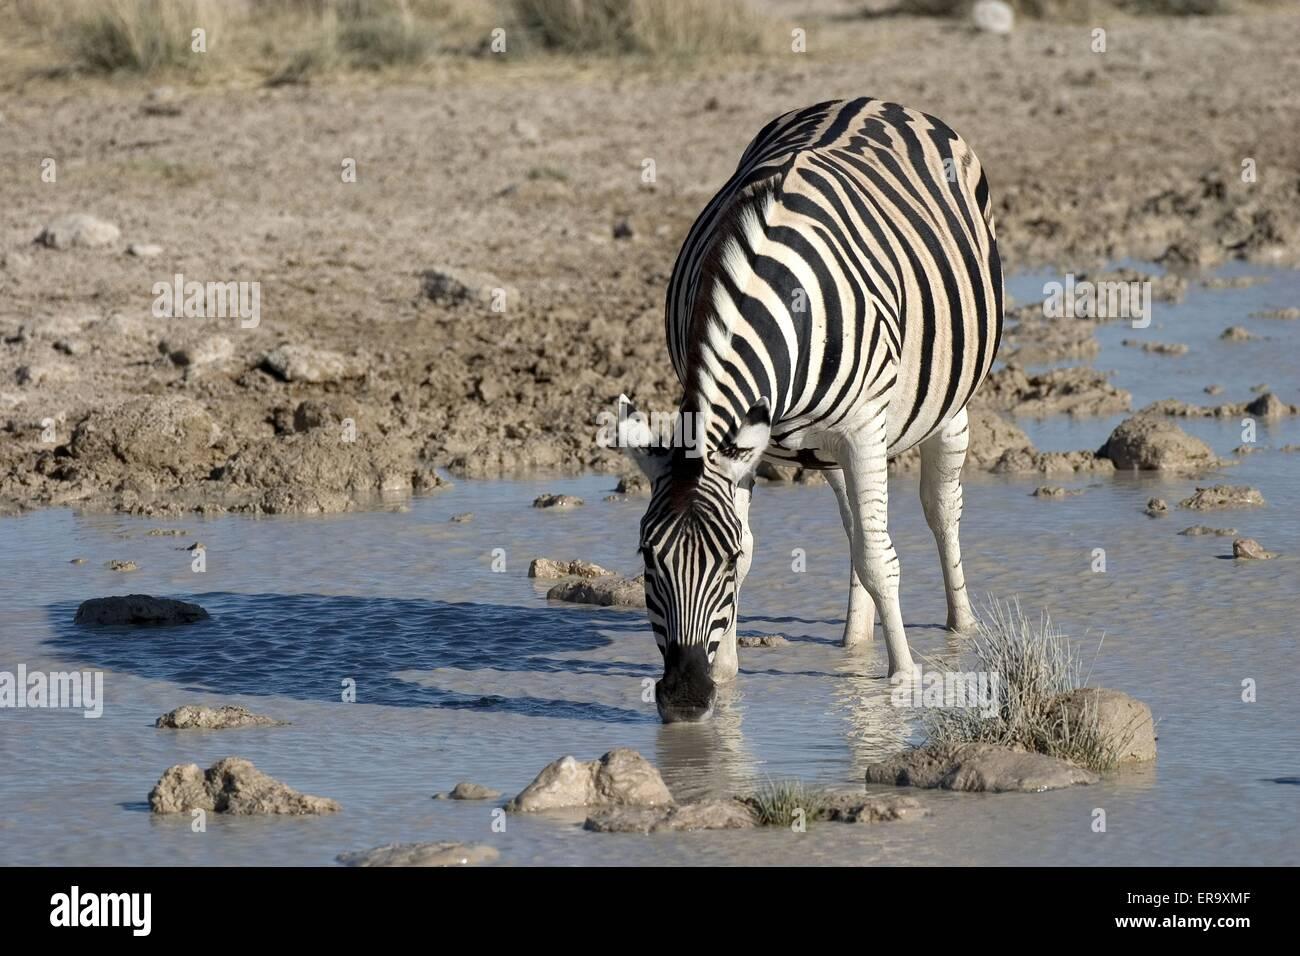 drinking zebra - Stock Image